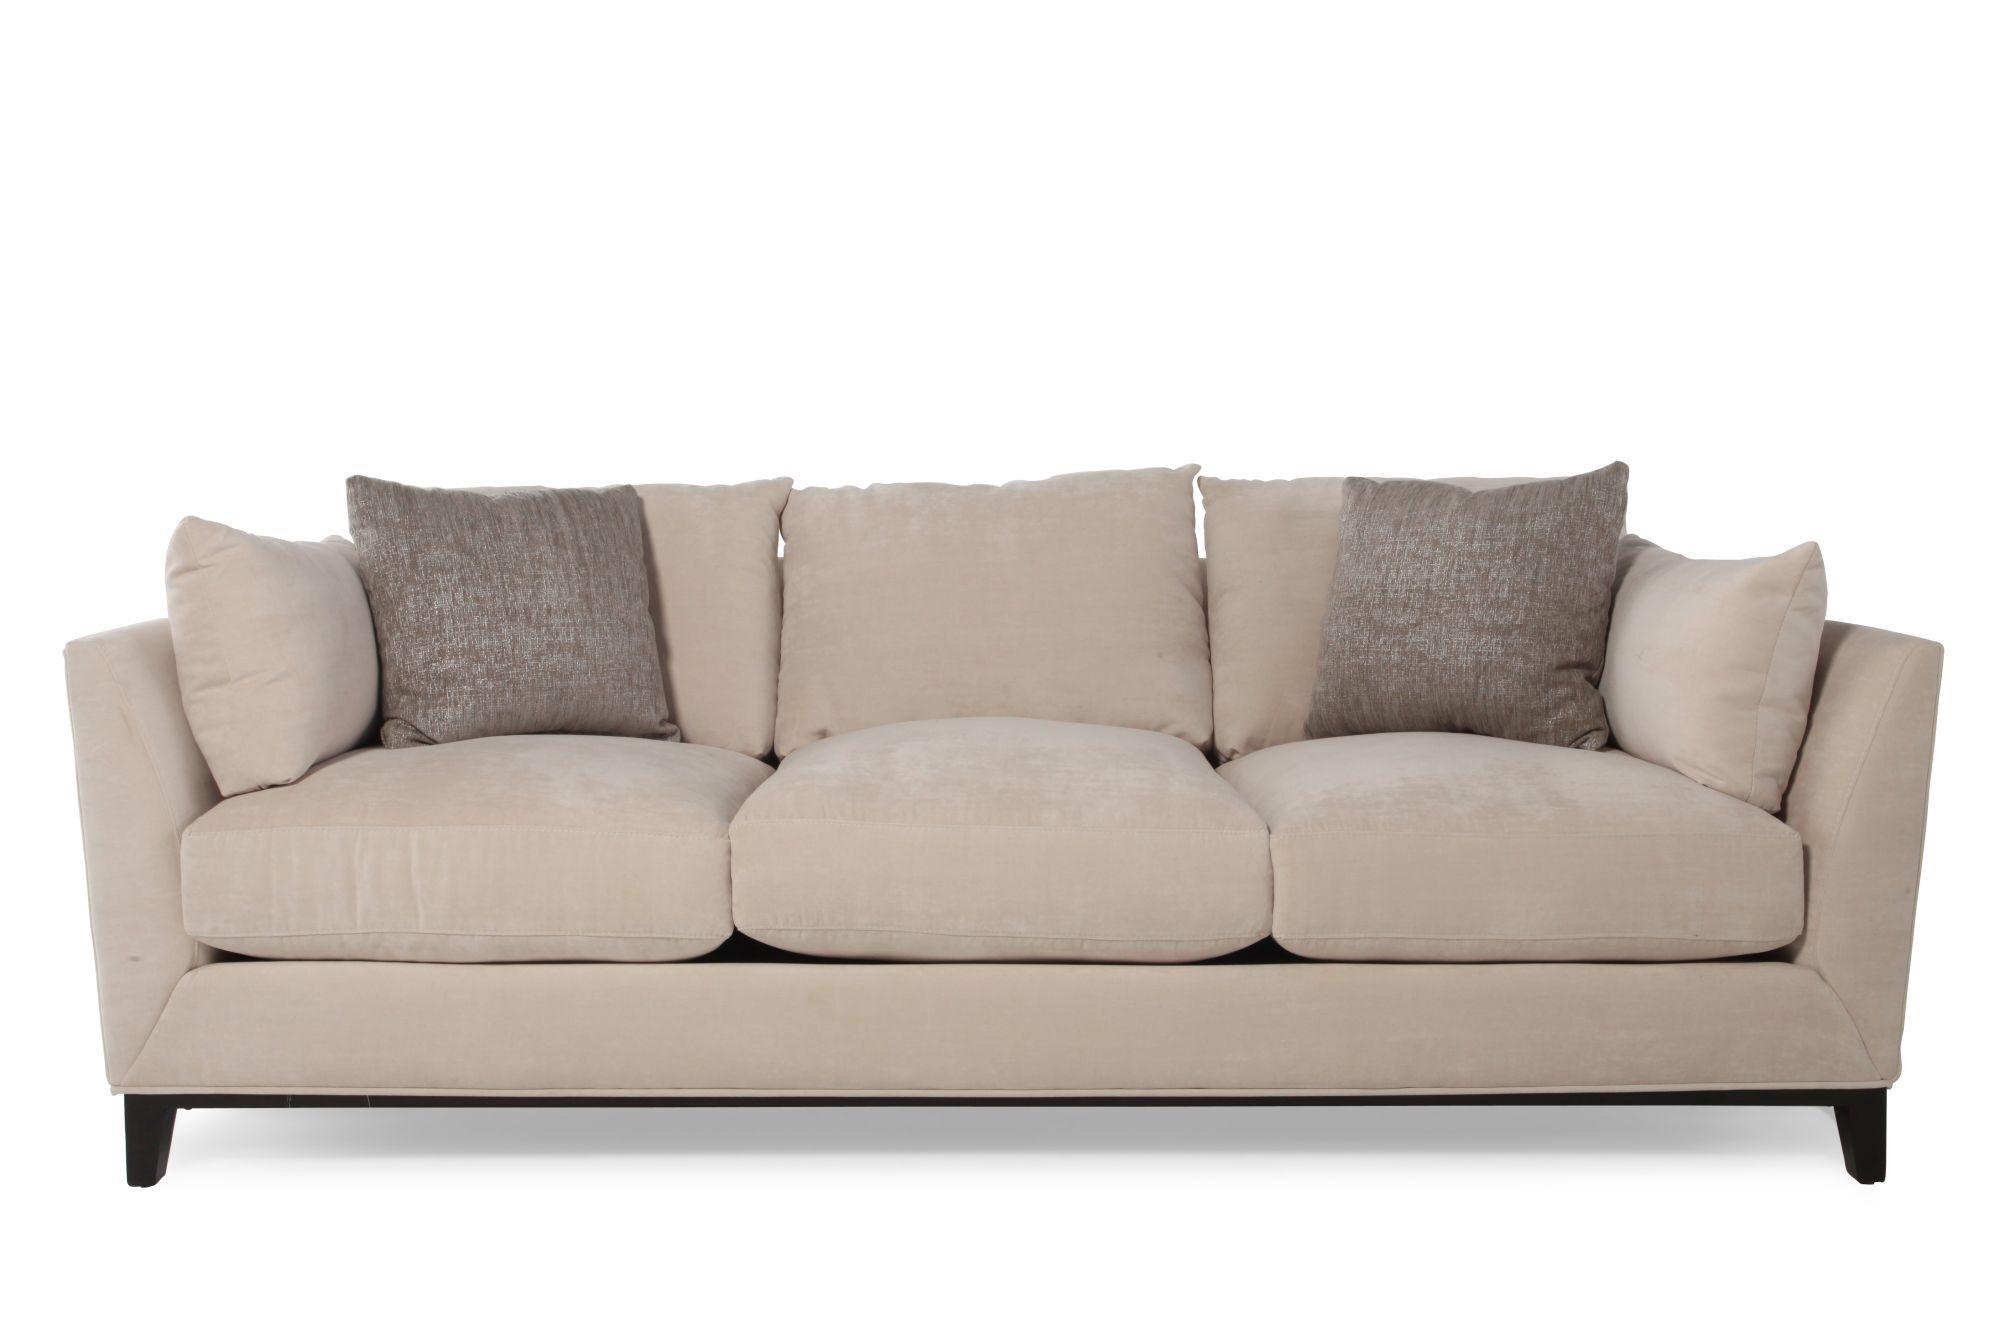 jonathan louis sofas cheap chesterfield sofa lewis burton modern sectional